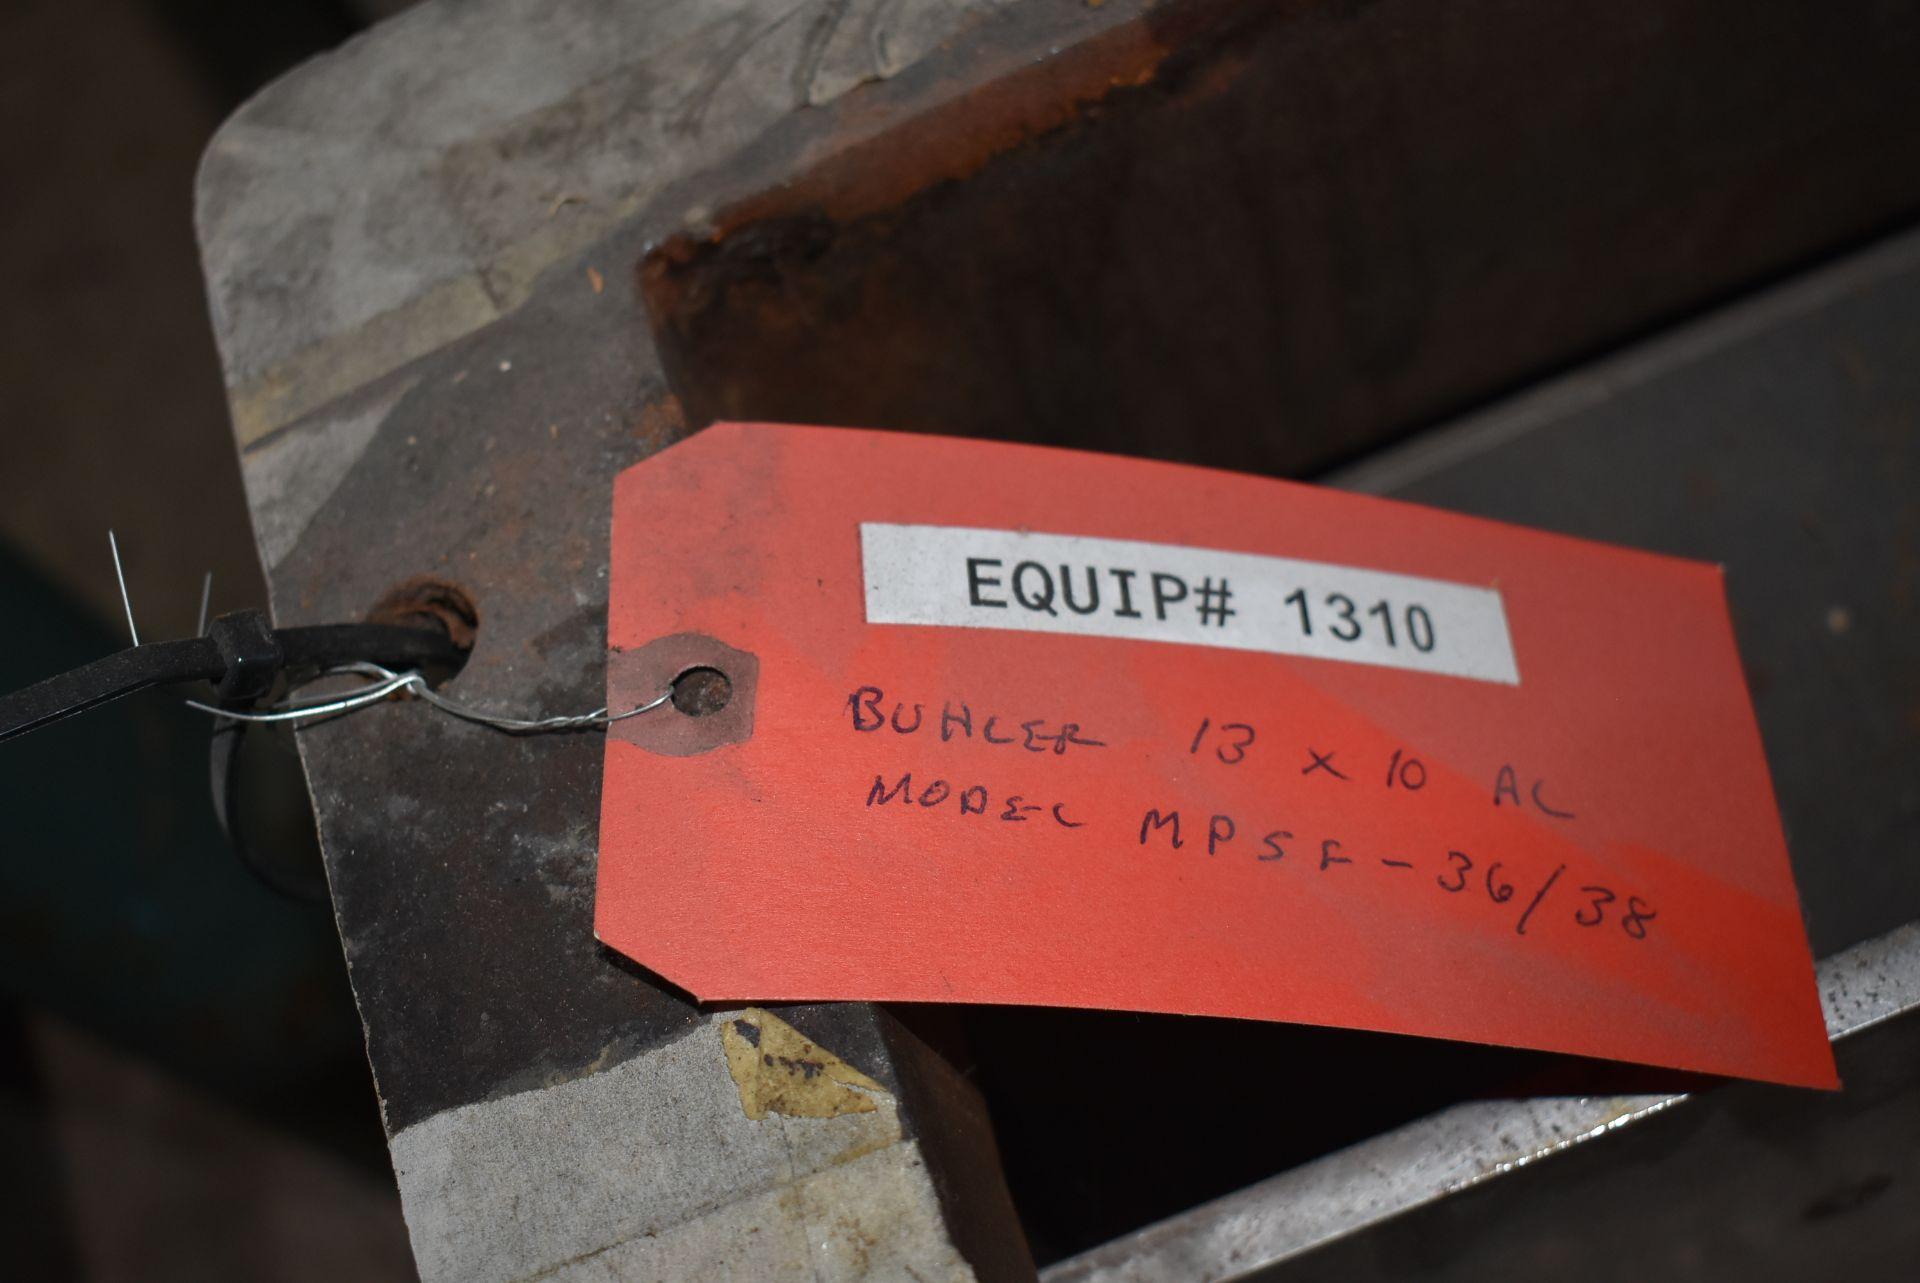 "Buhler Sz. 13"" x 10"" Air Lock - Image 2 of 2"